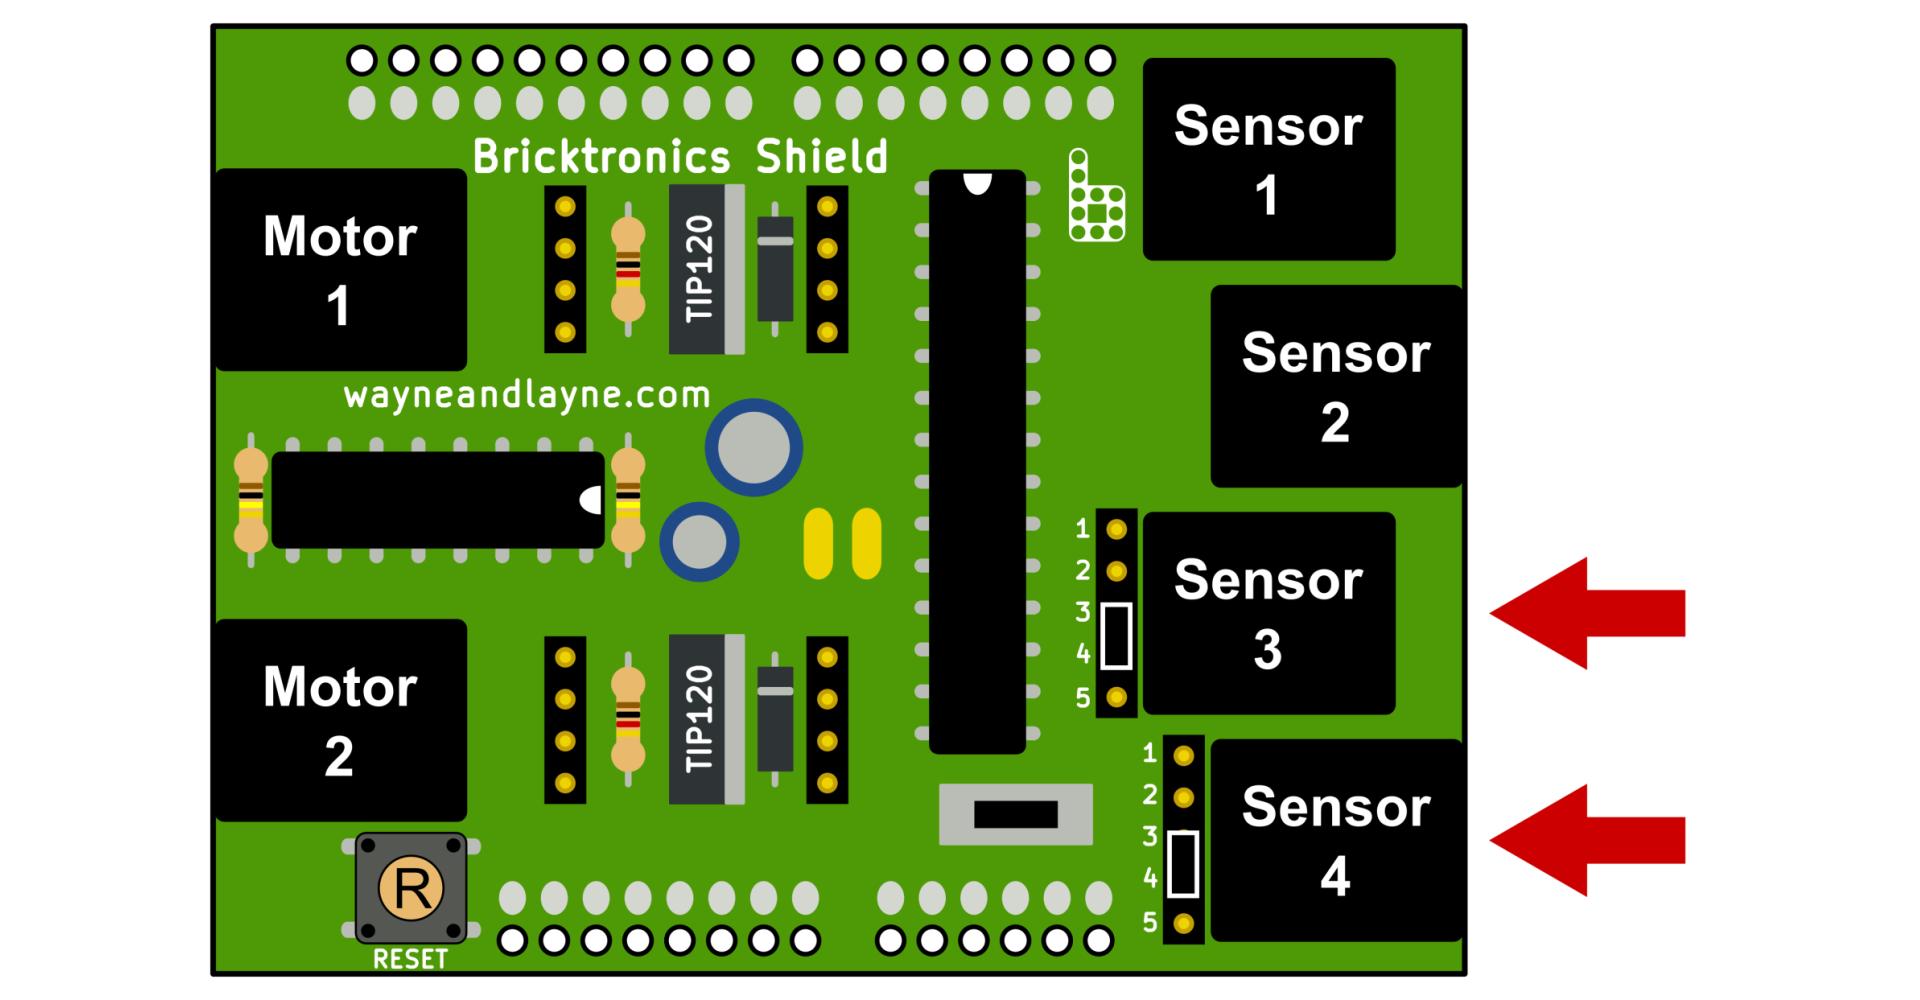 Photo of circuit layout for NXT Touch Sensor from Wayne and Layne | https://www.wayneandlayne.com/bricktronics/sensors/